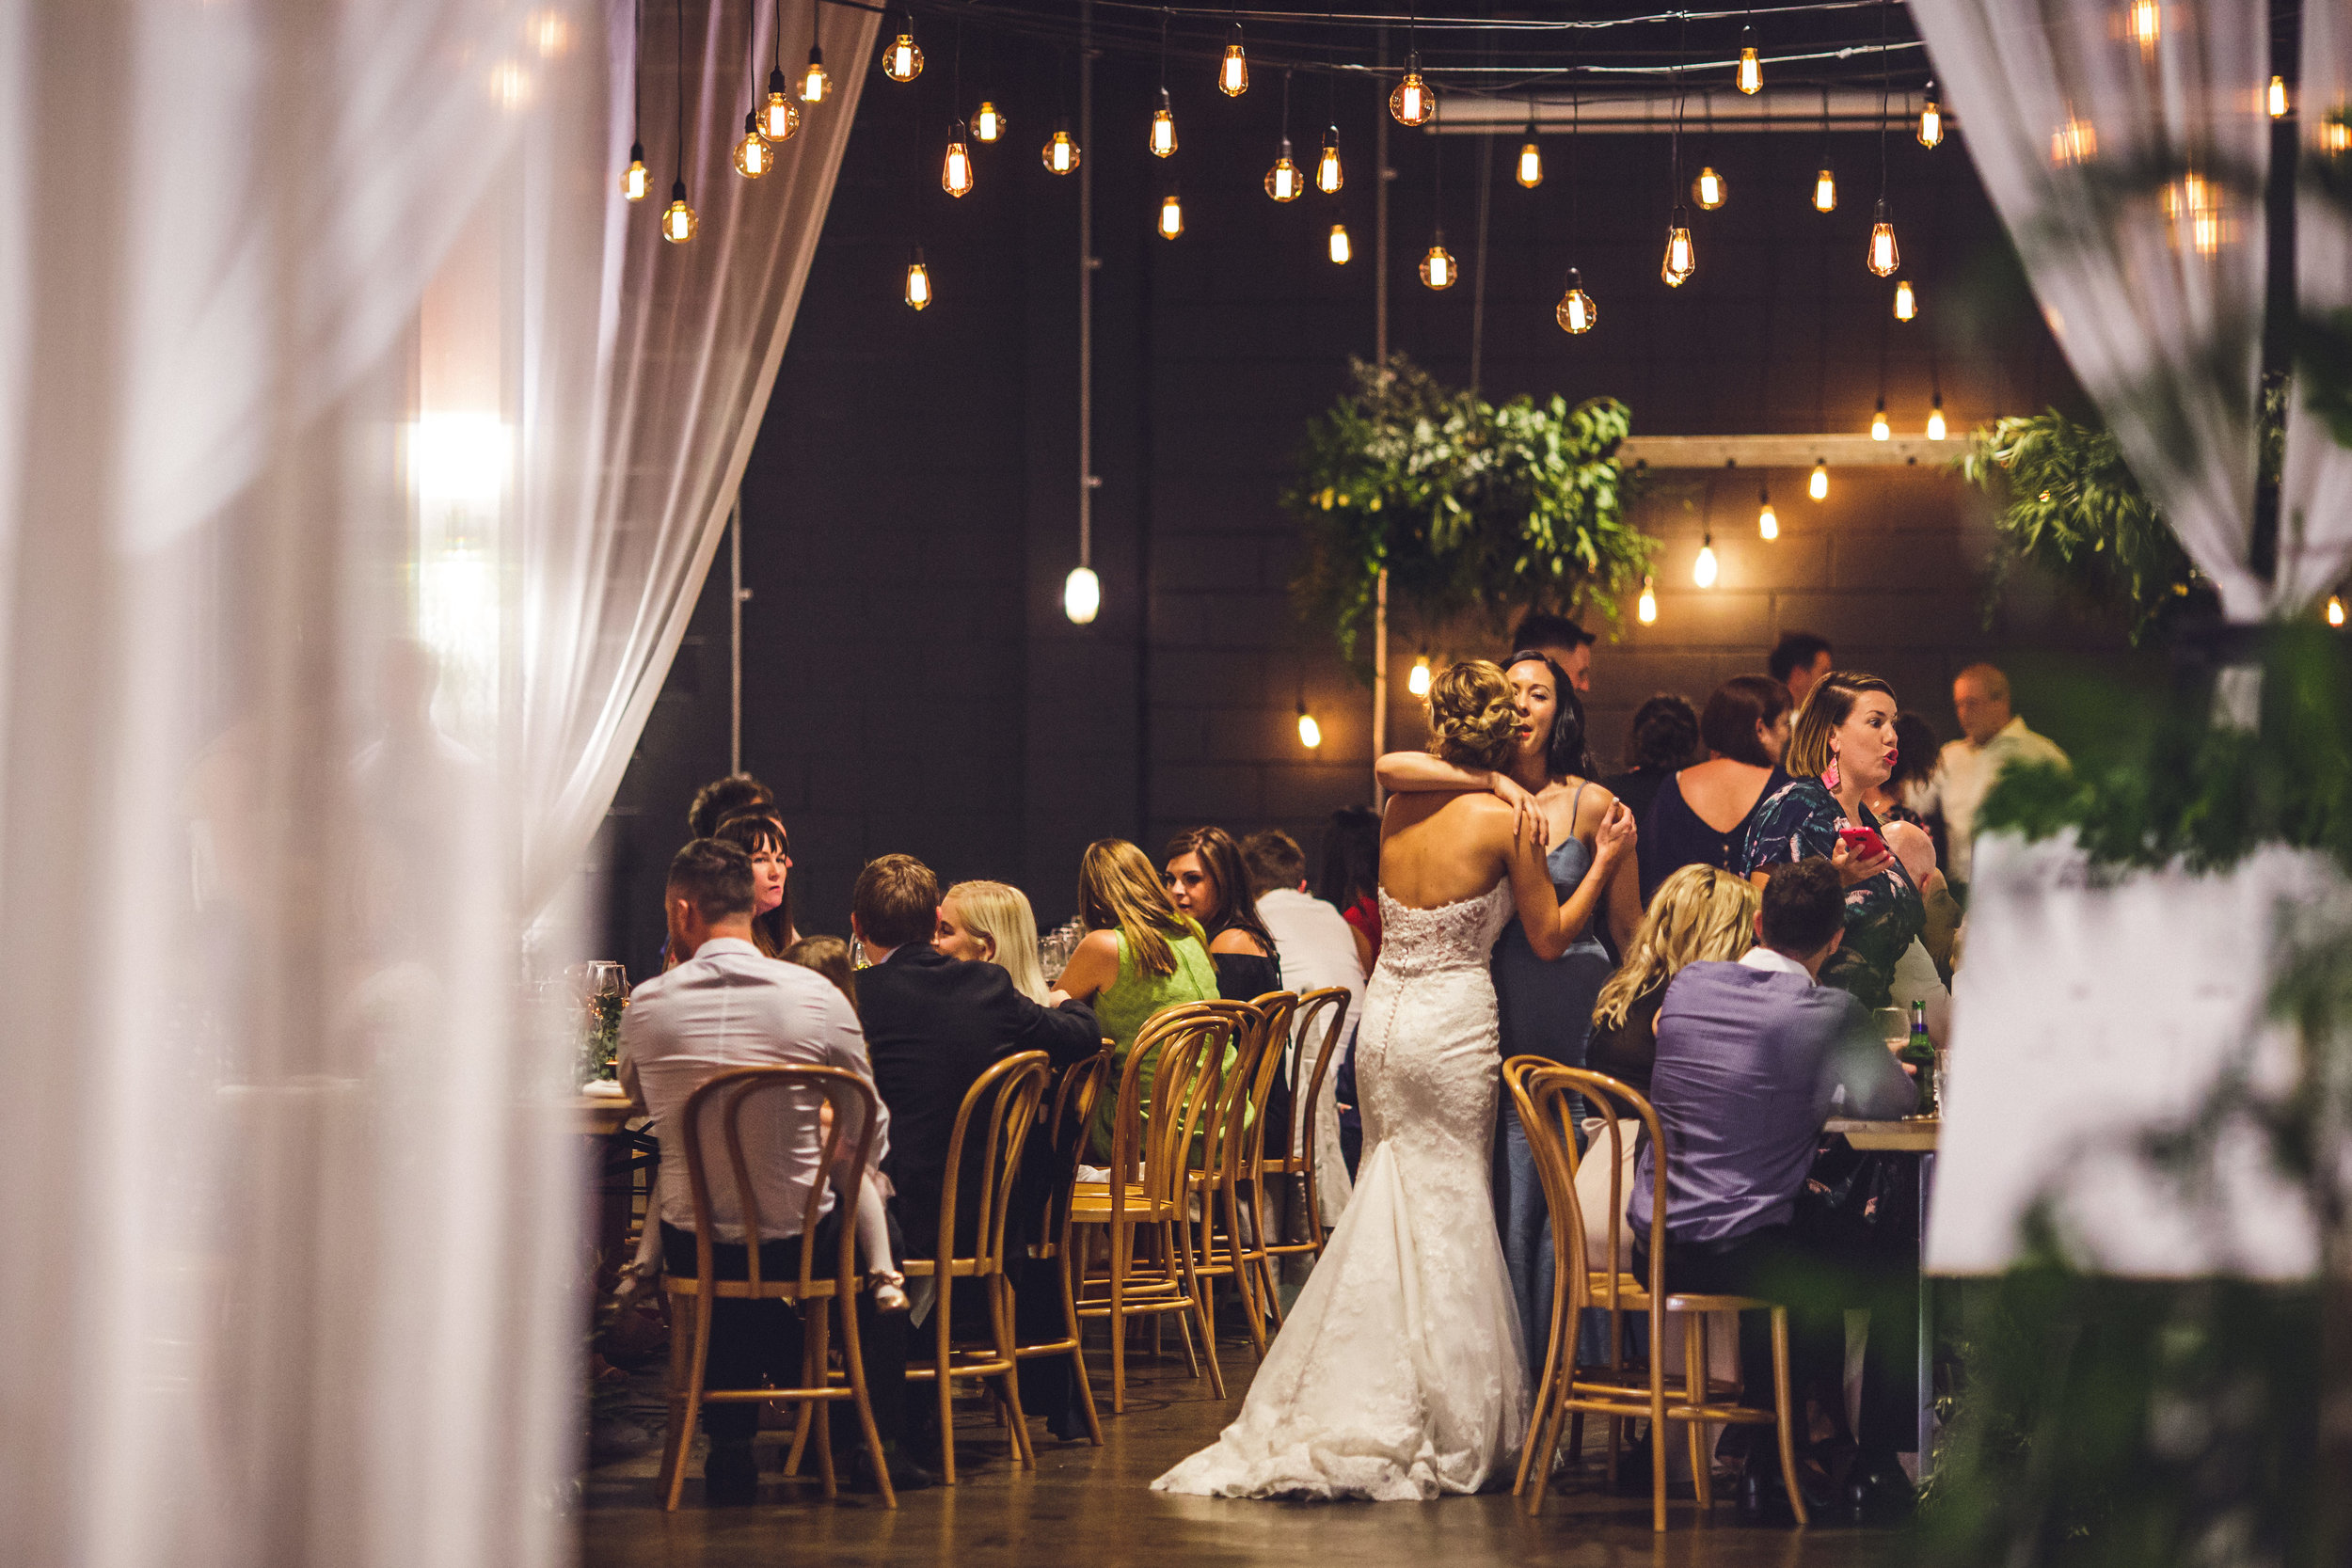 lightspace-brisbane-wedding-043.JPG